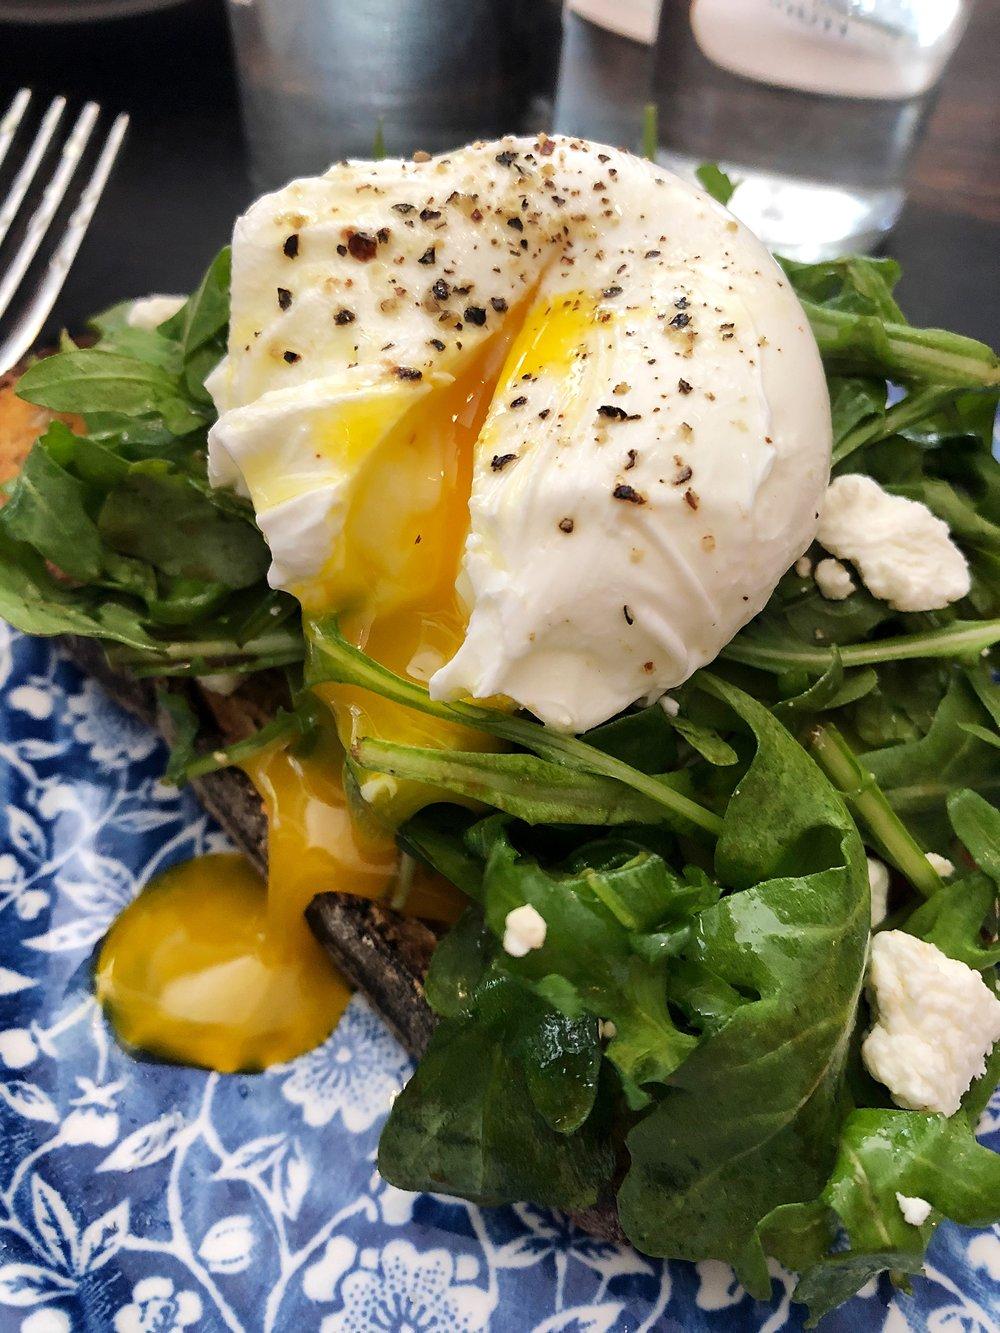 Avocado toast + add an egg